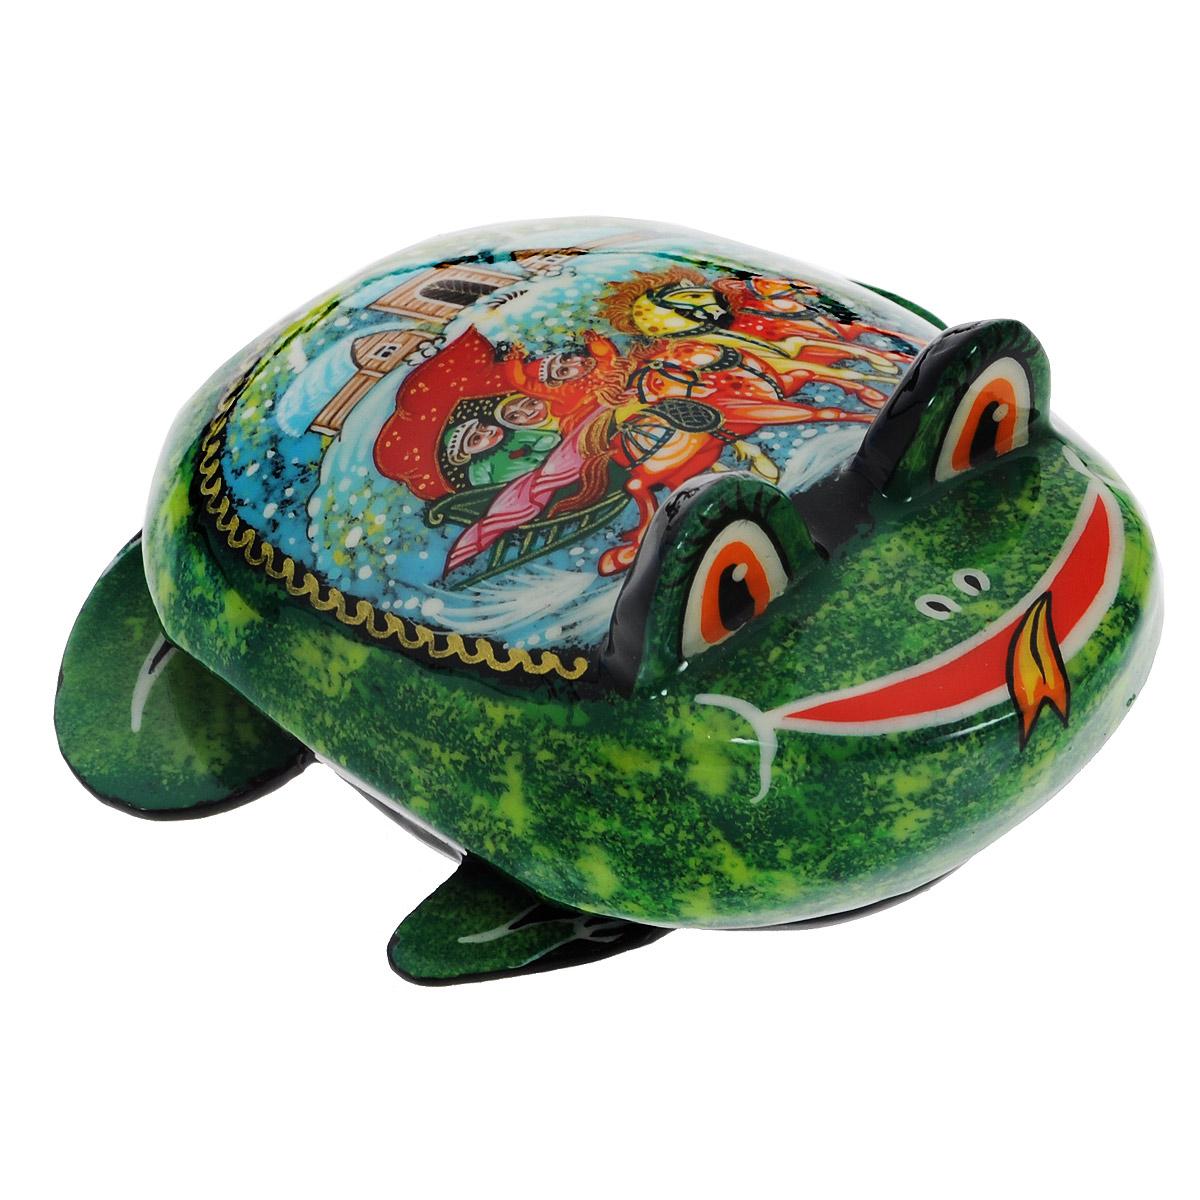 Лаковая миниатюра-шкатулка Палех Лягушка, цвет: зеленый, 5 см. Ручная работа1пс1